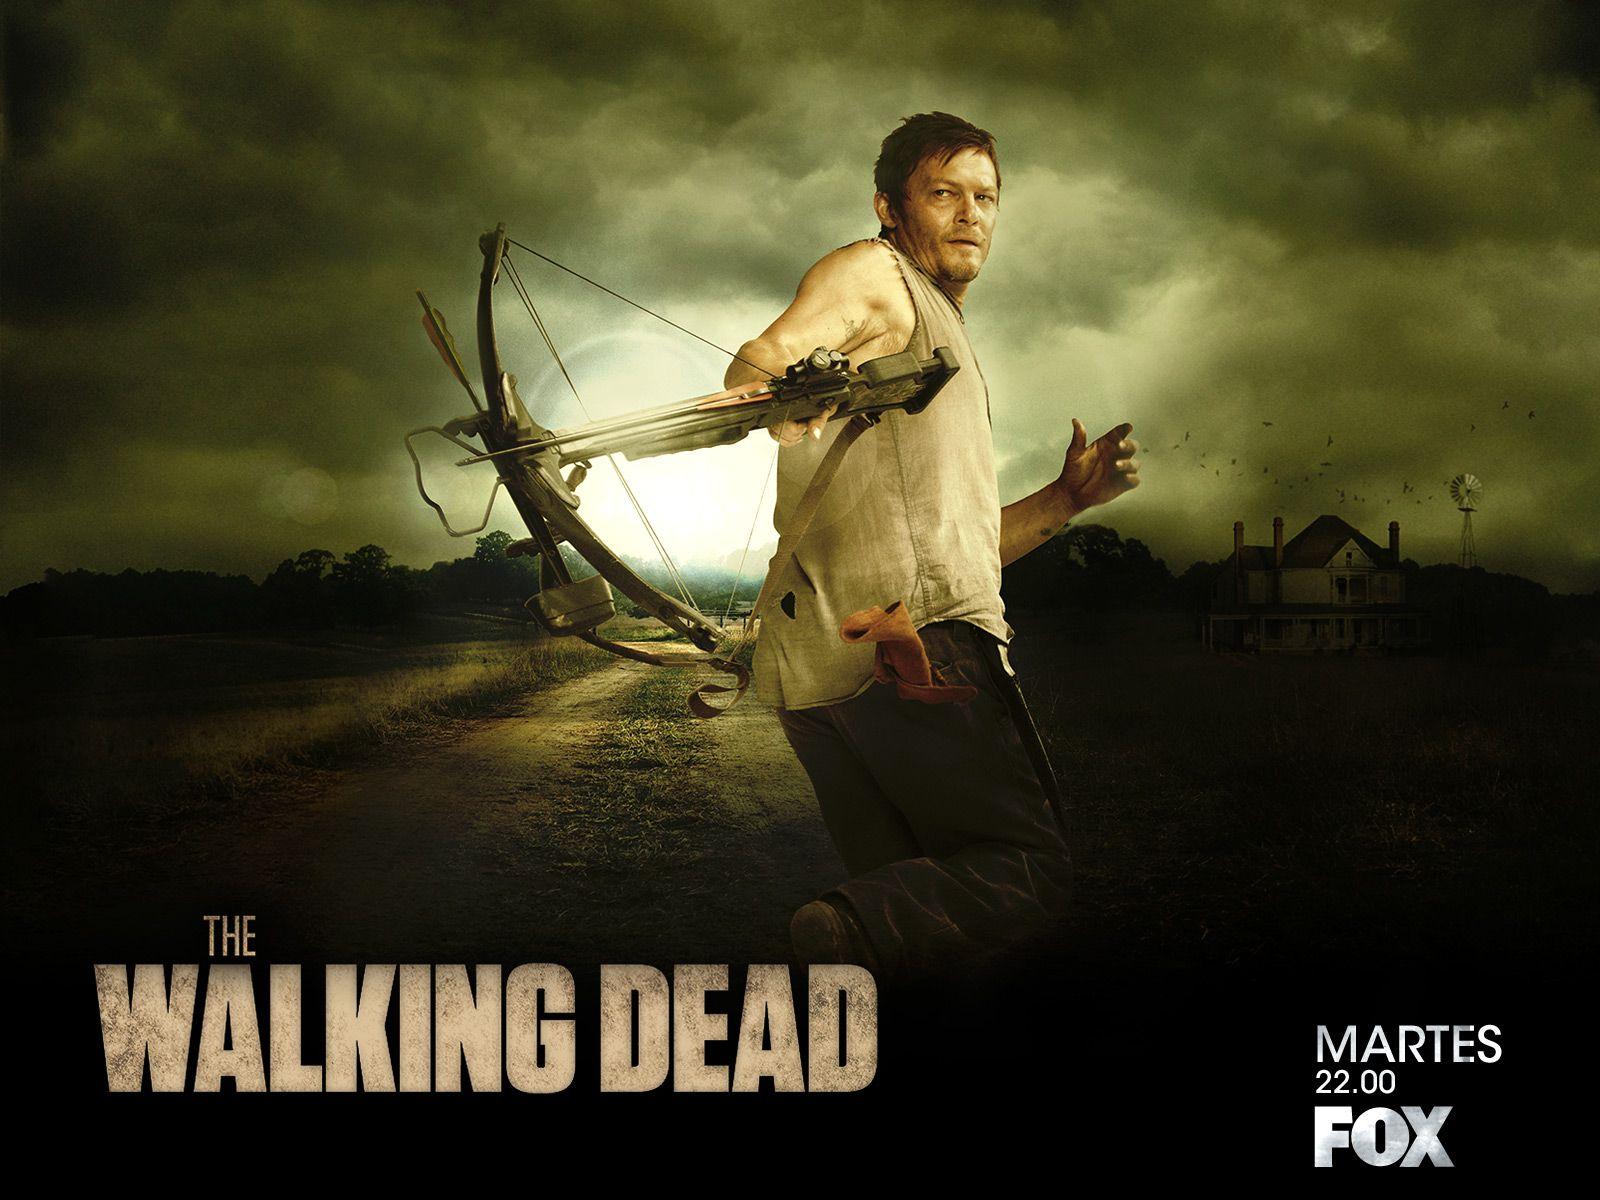 The Walking Dead Wallpaper Daryl Dixon